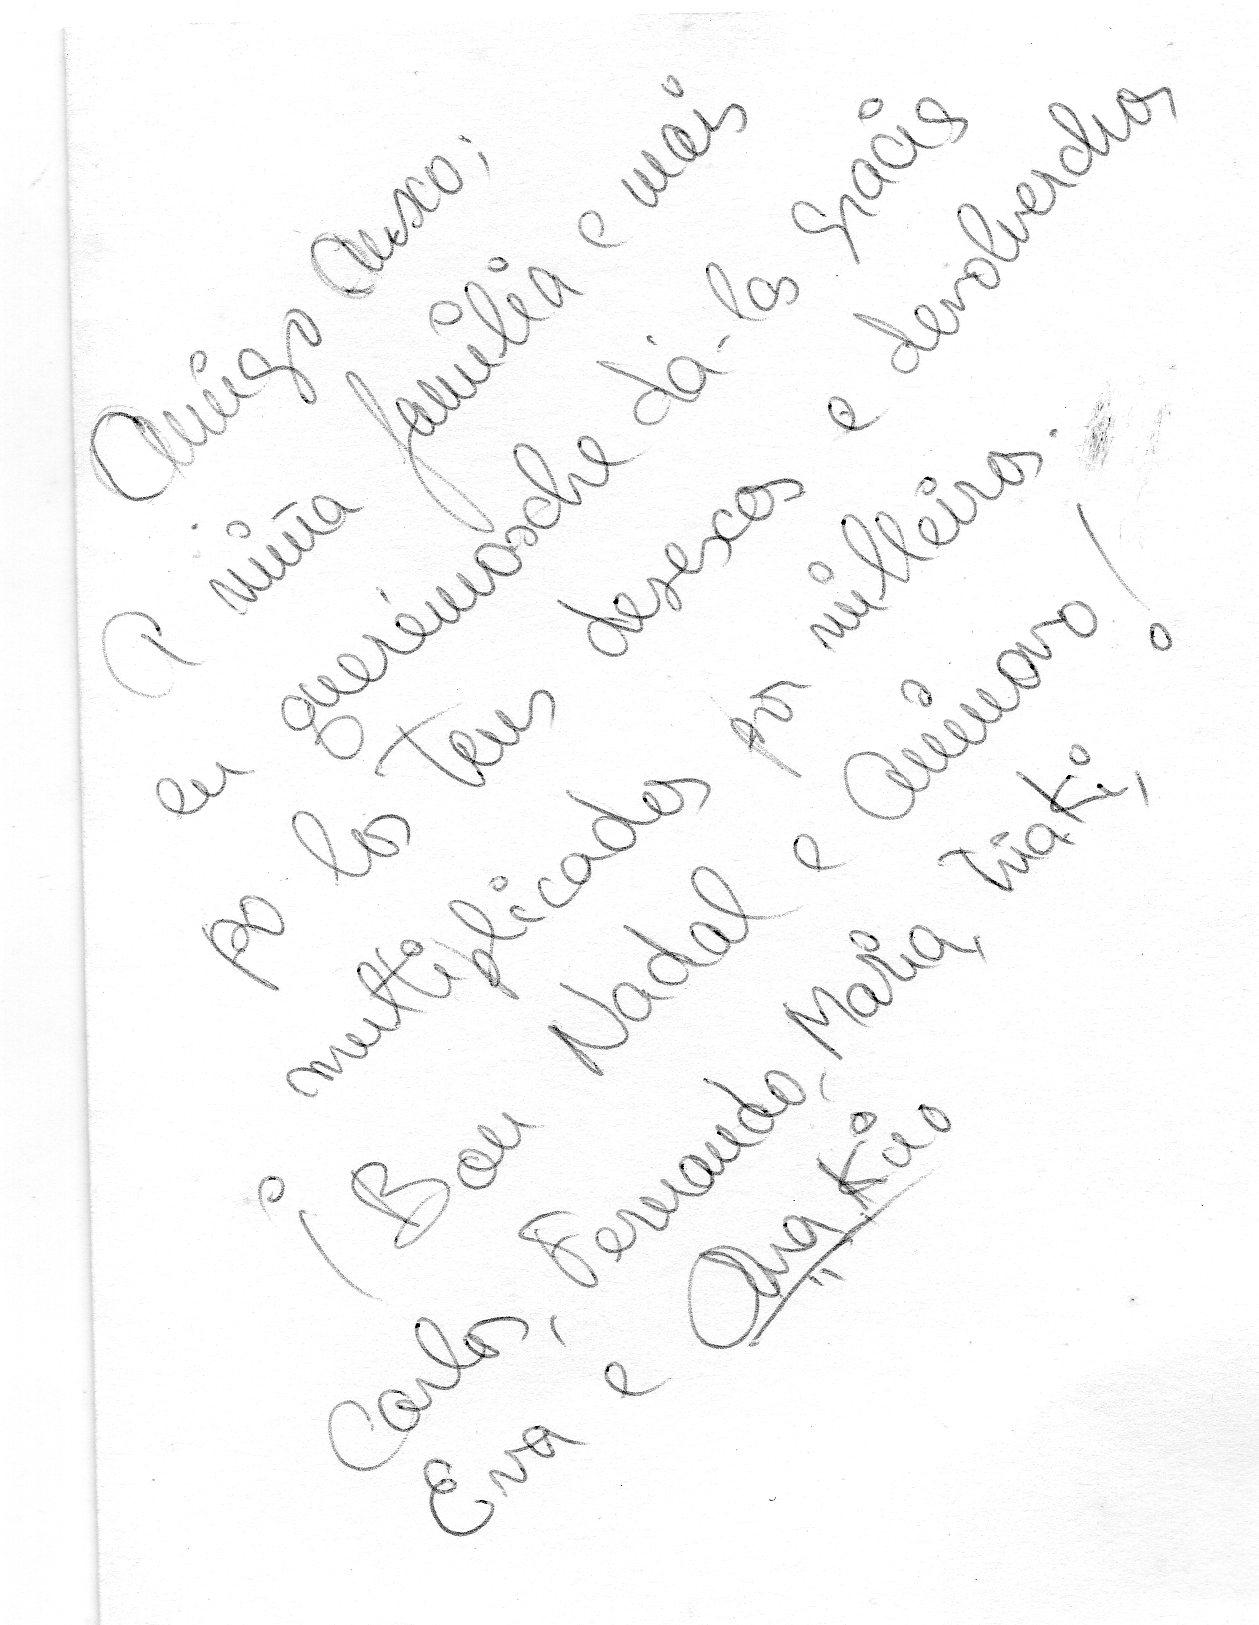 Carta de Ana Kiro a Anxo Lamas